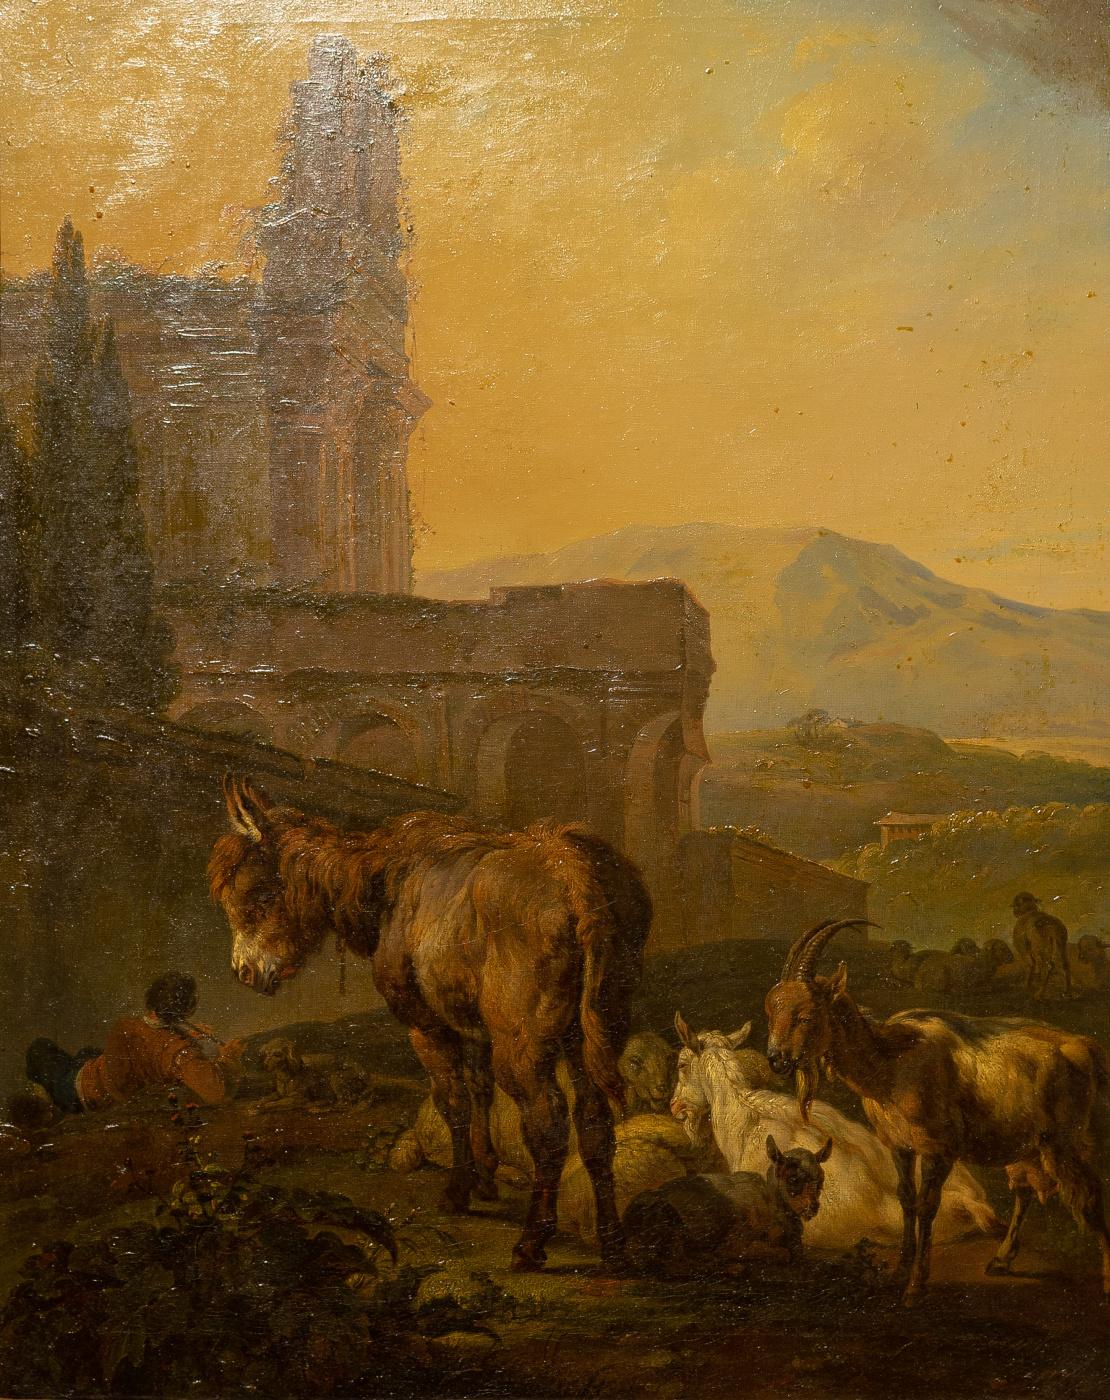 Wilhelm von kobel. Shepherd